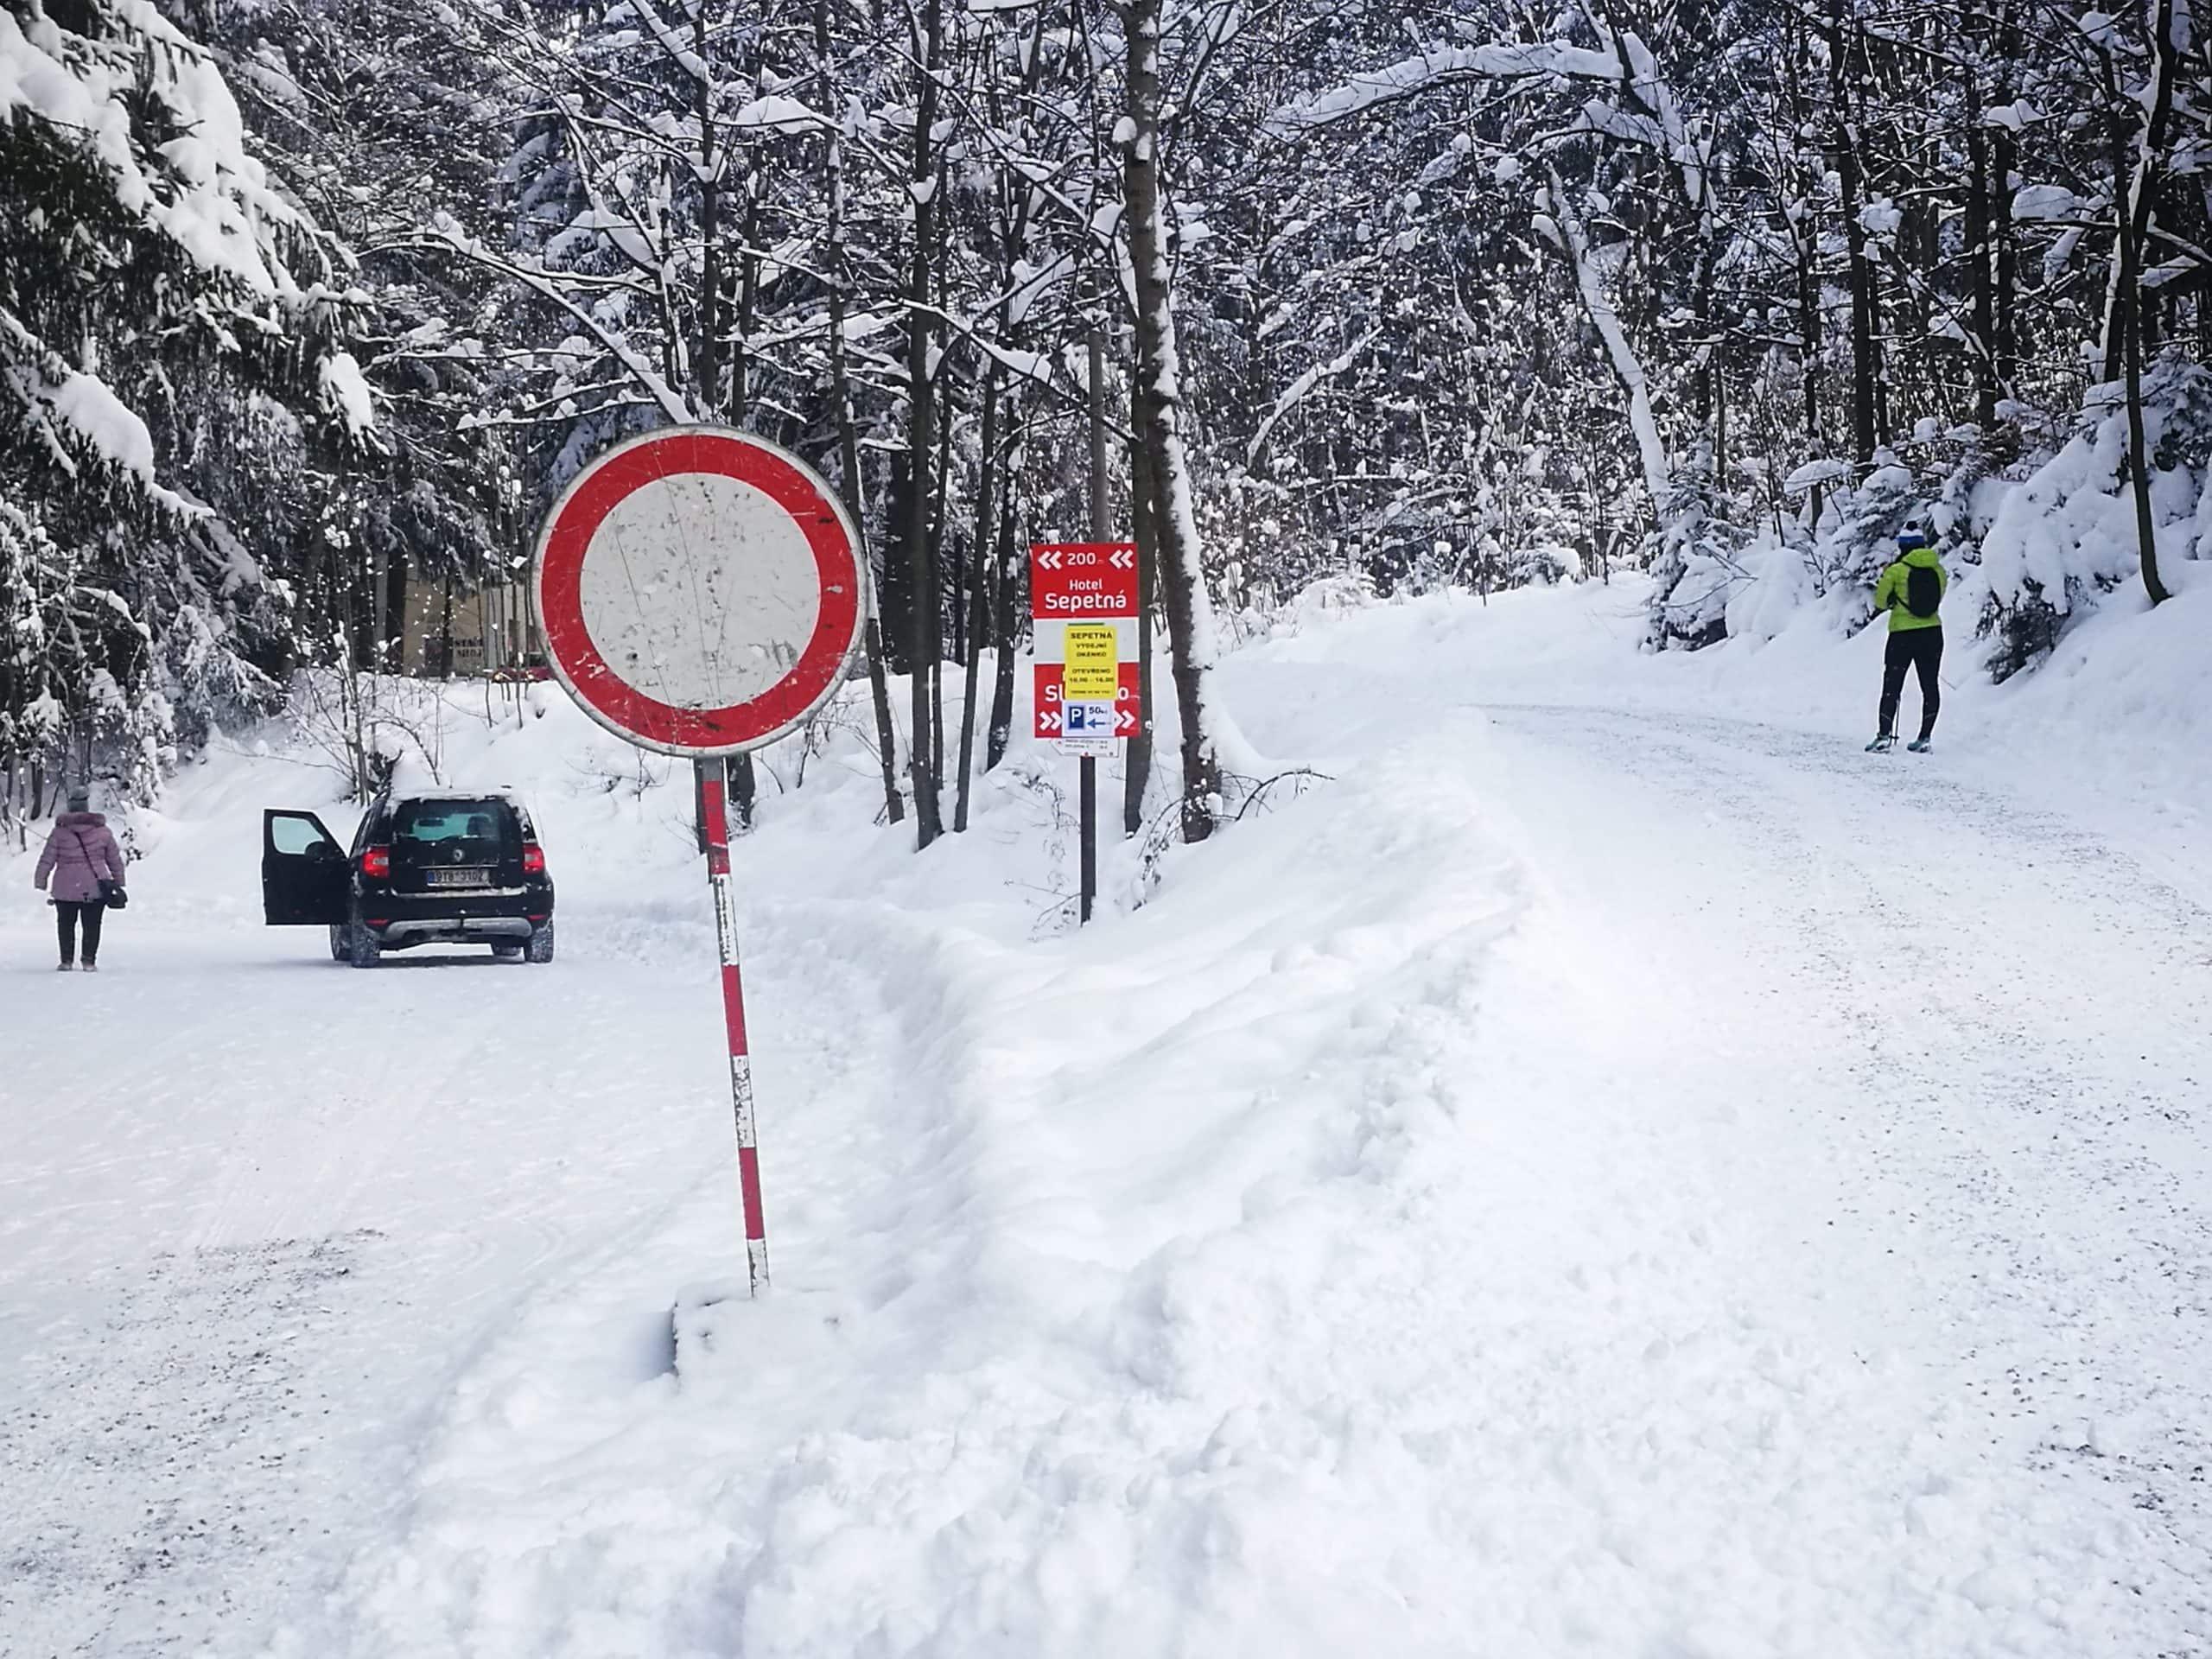 Znacka-vidlicka-Sepetna-zakaz-zima